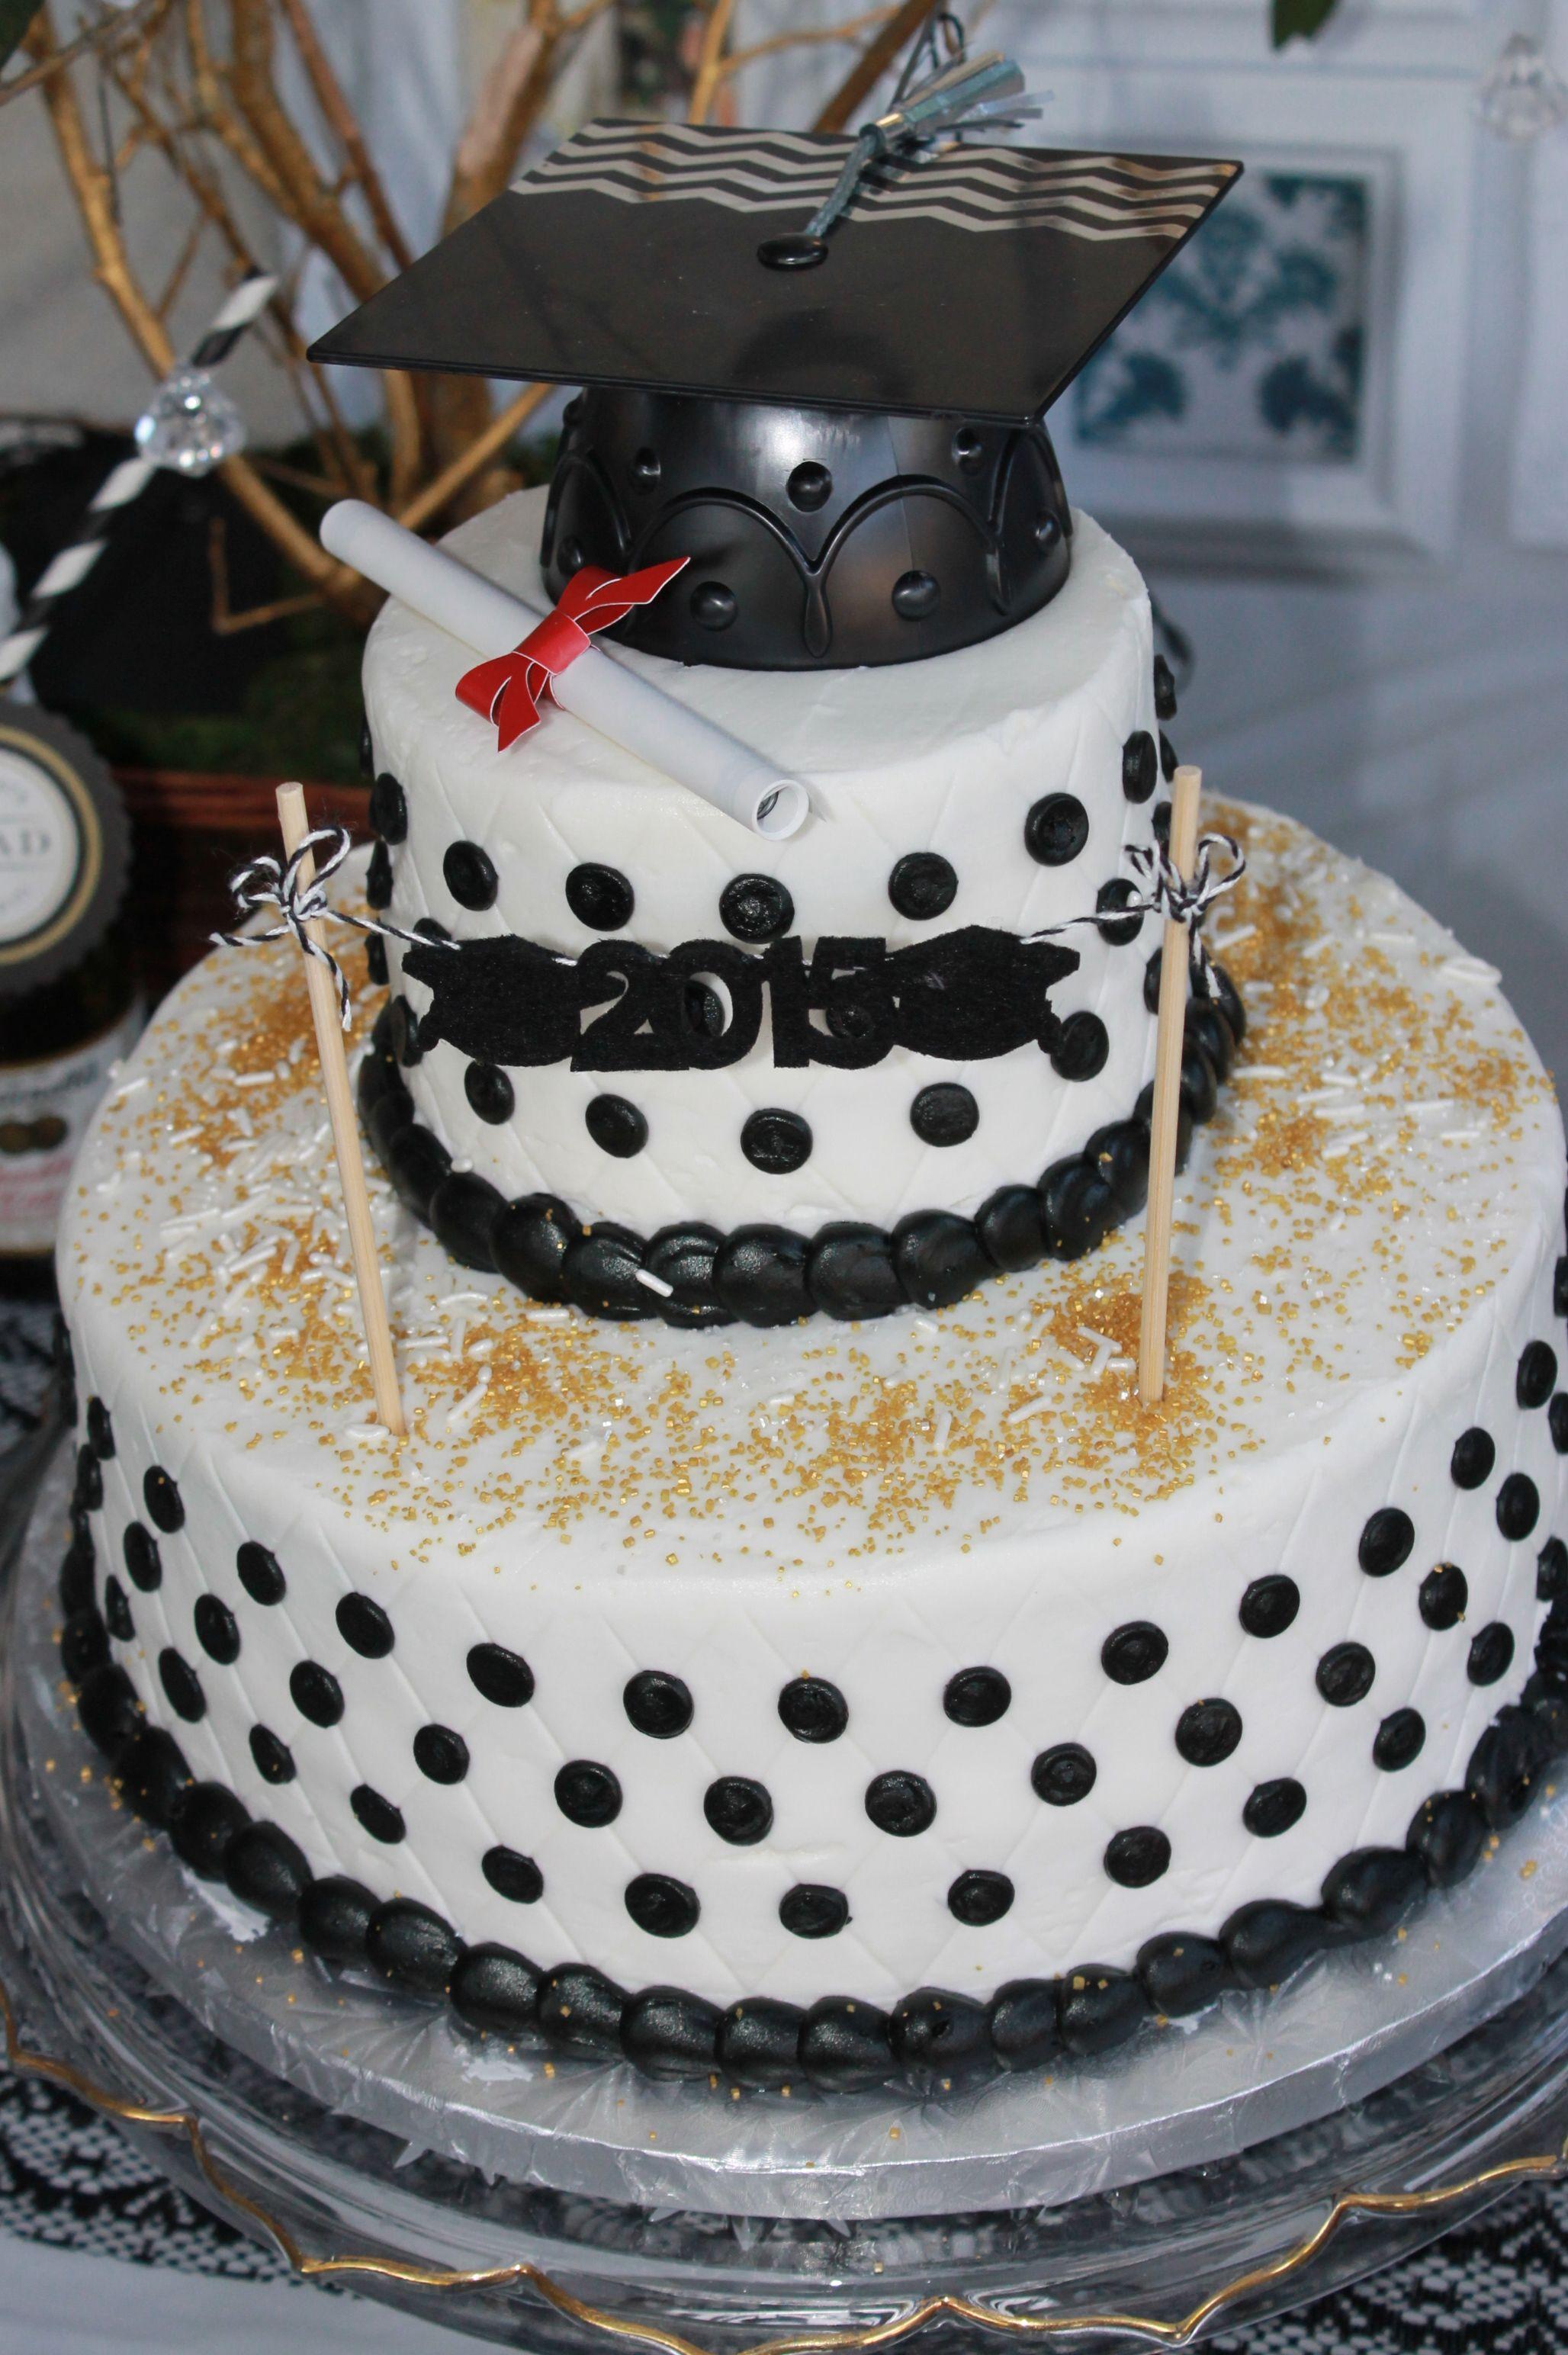 Sams Club Bakery Birthday Cake Designs